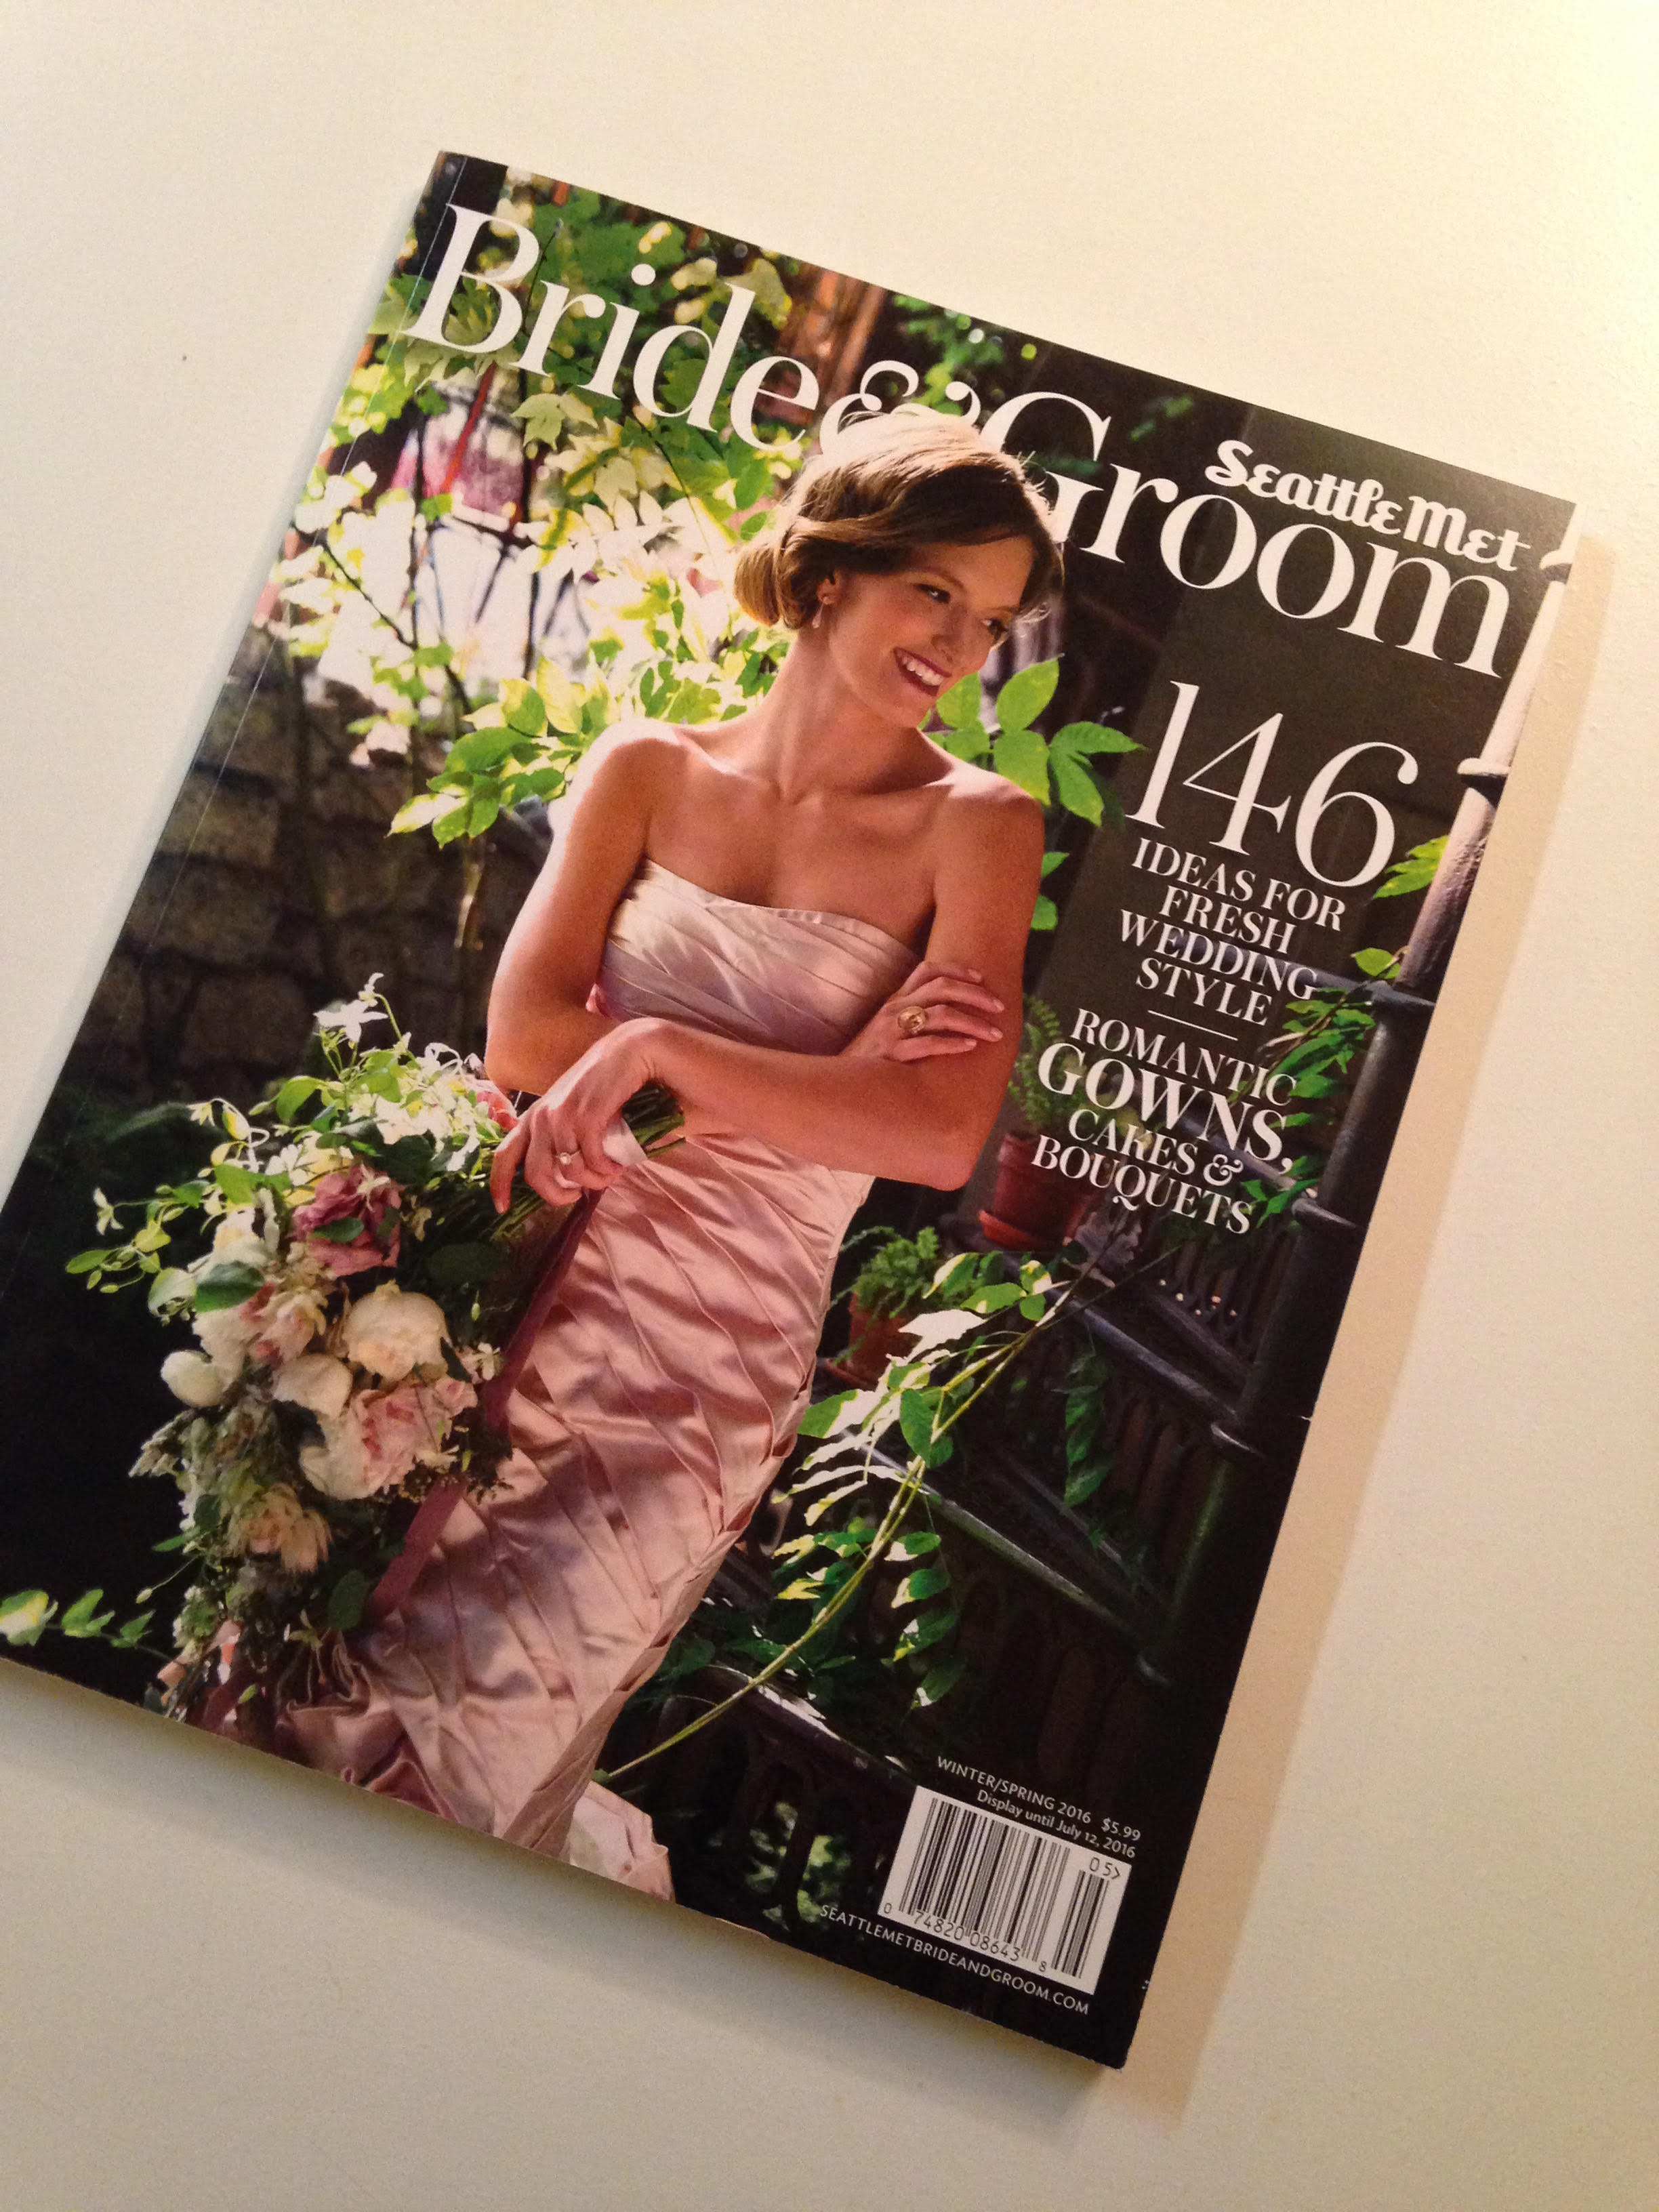 vases wild featured seattle bride groom magazine